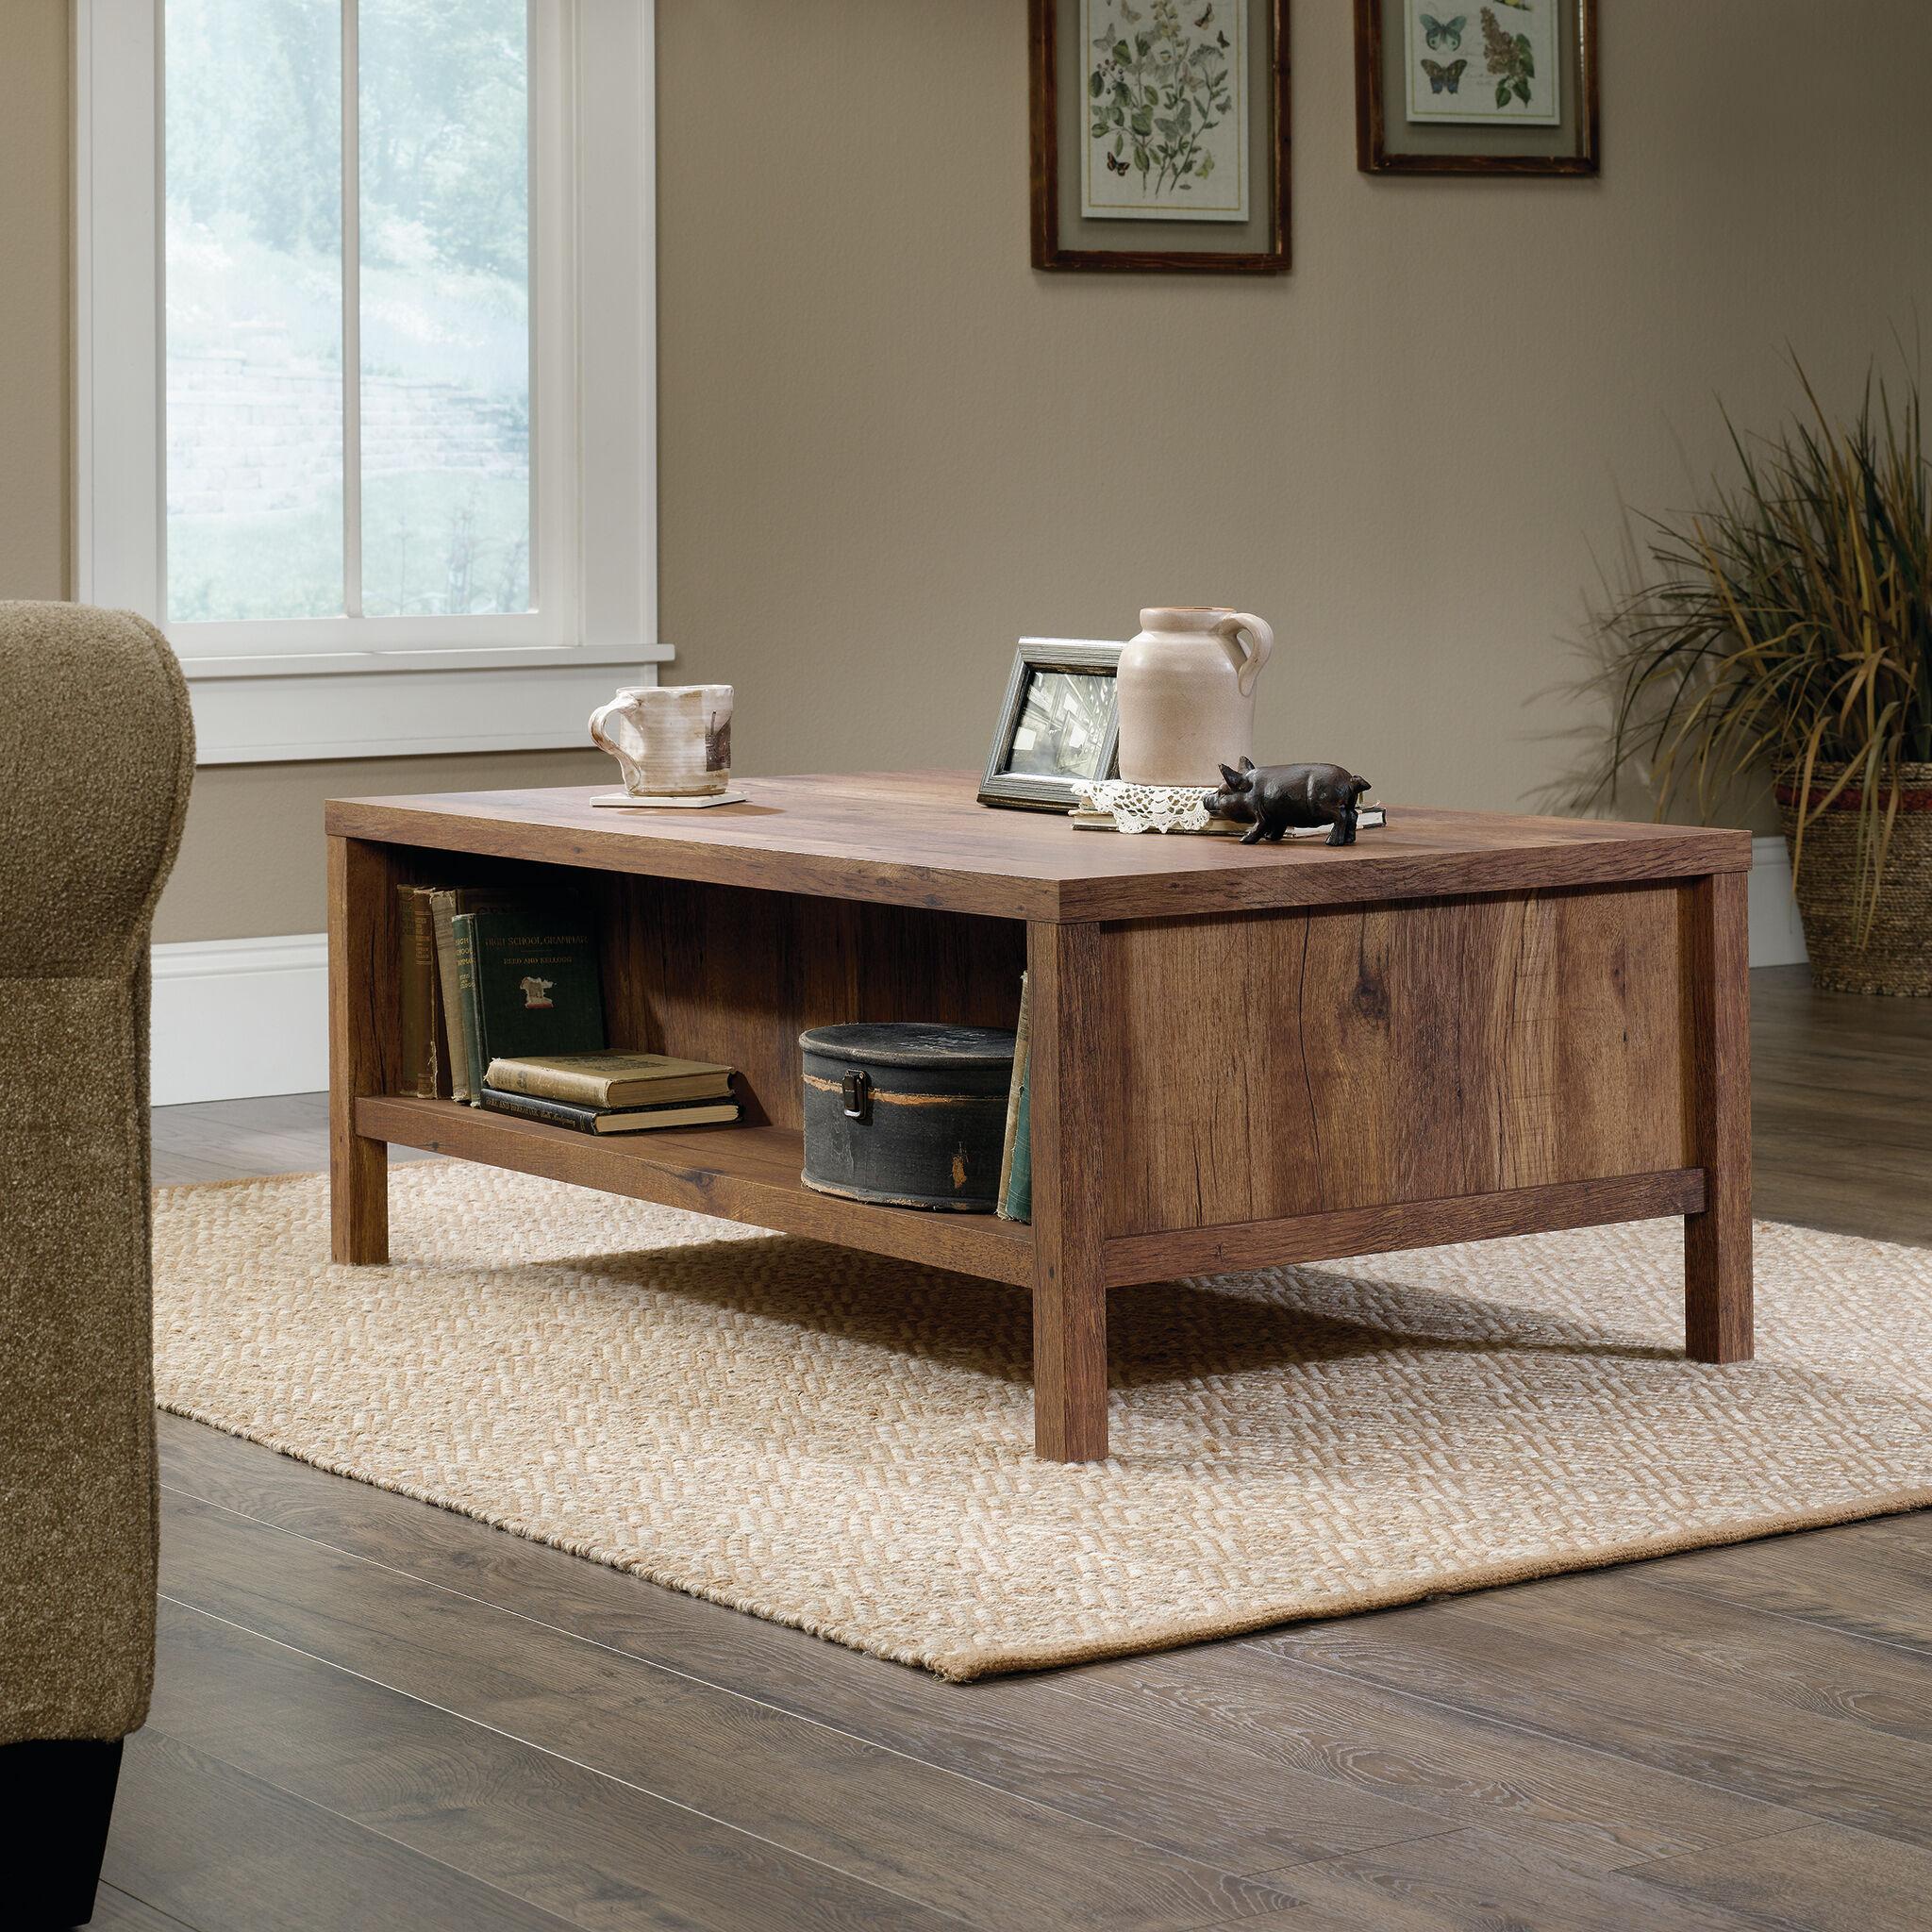 Rectangular Contemporary Coffee Tableu0026nbsp;in Vintage Oak